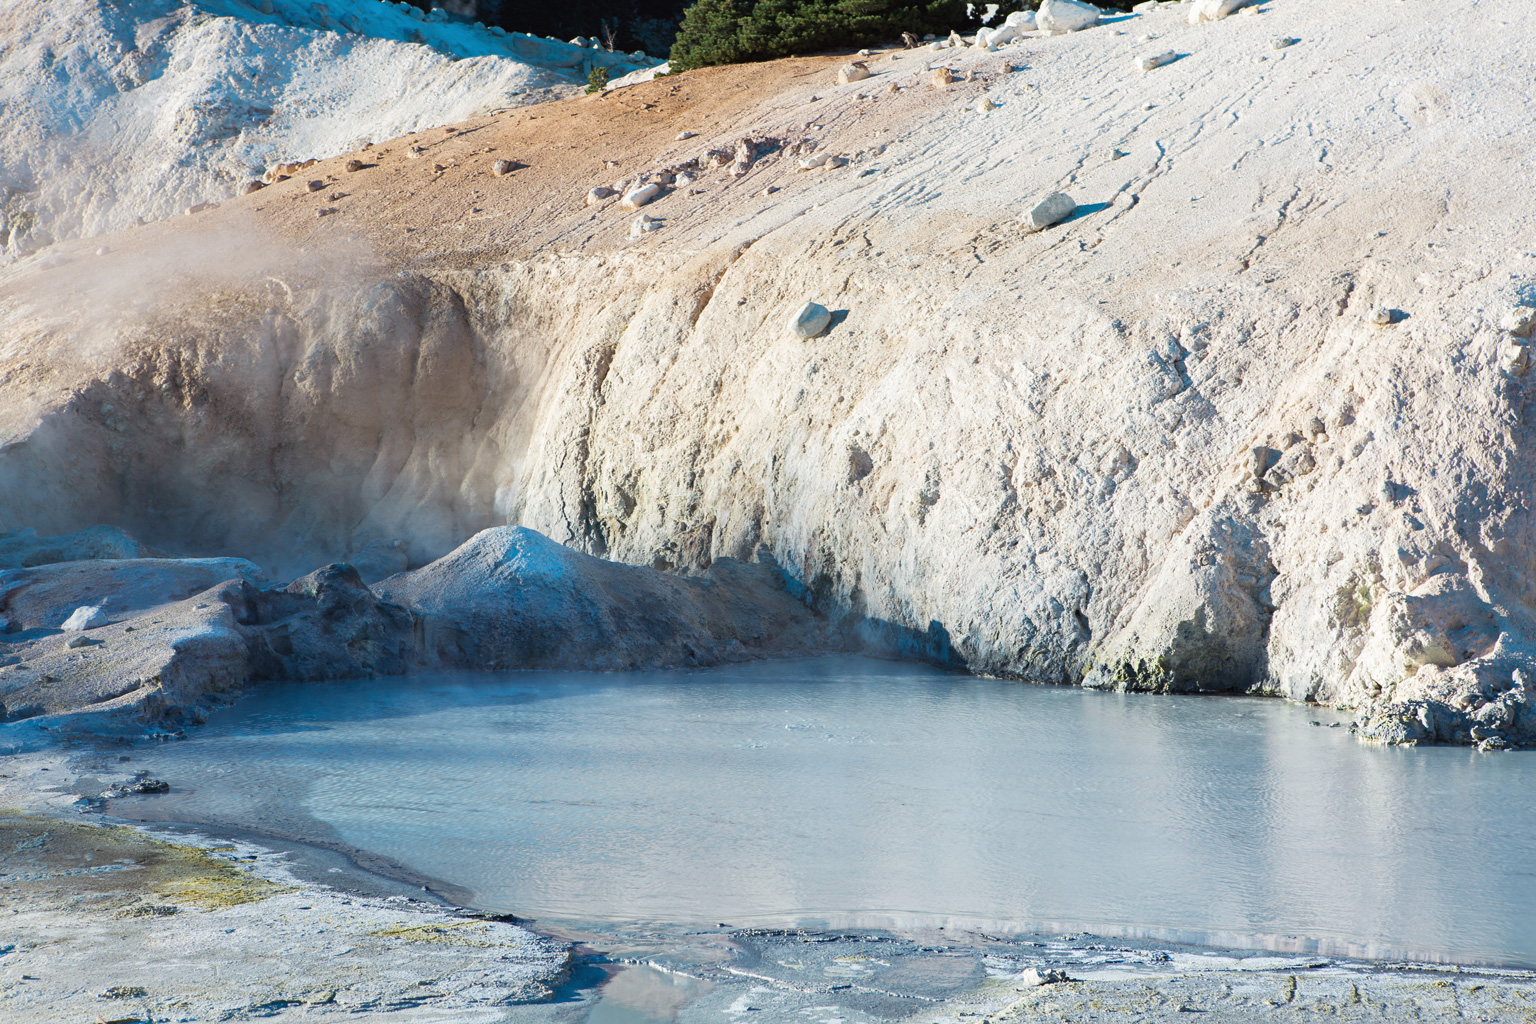 CindyGiovagnoli_Lassen_Volcanic_National_Park_California_camp_road_trip-010.jpg